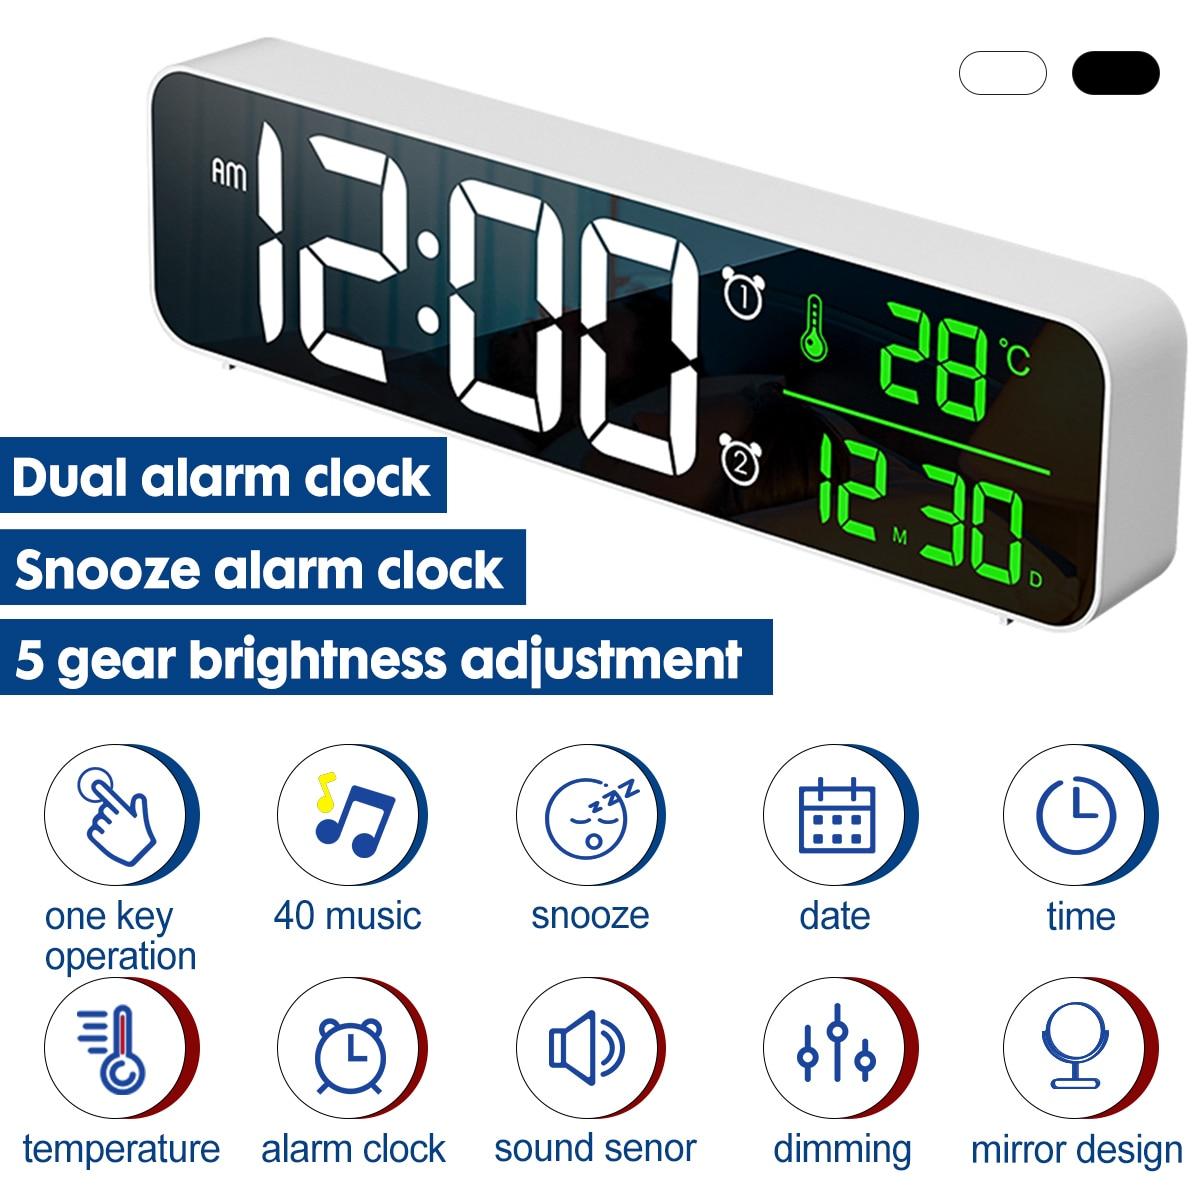 LED Digital Alarm Clock Dual Mode Bedrooms Snooze Electronic USB Desktop Mirror Clocks Home Table Decor 5 Brightness Adjustment